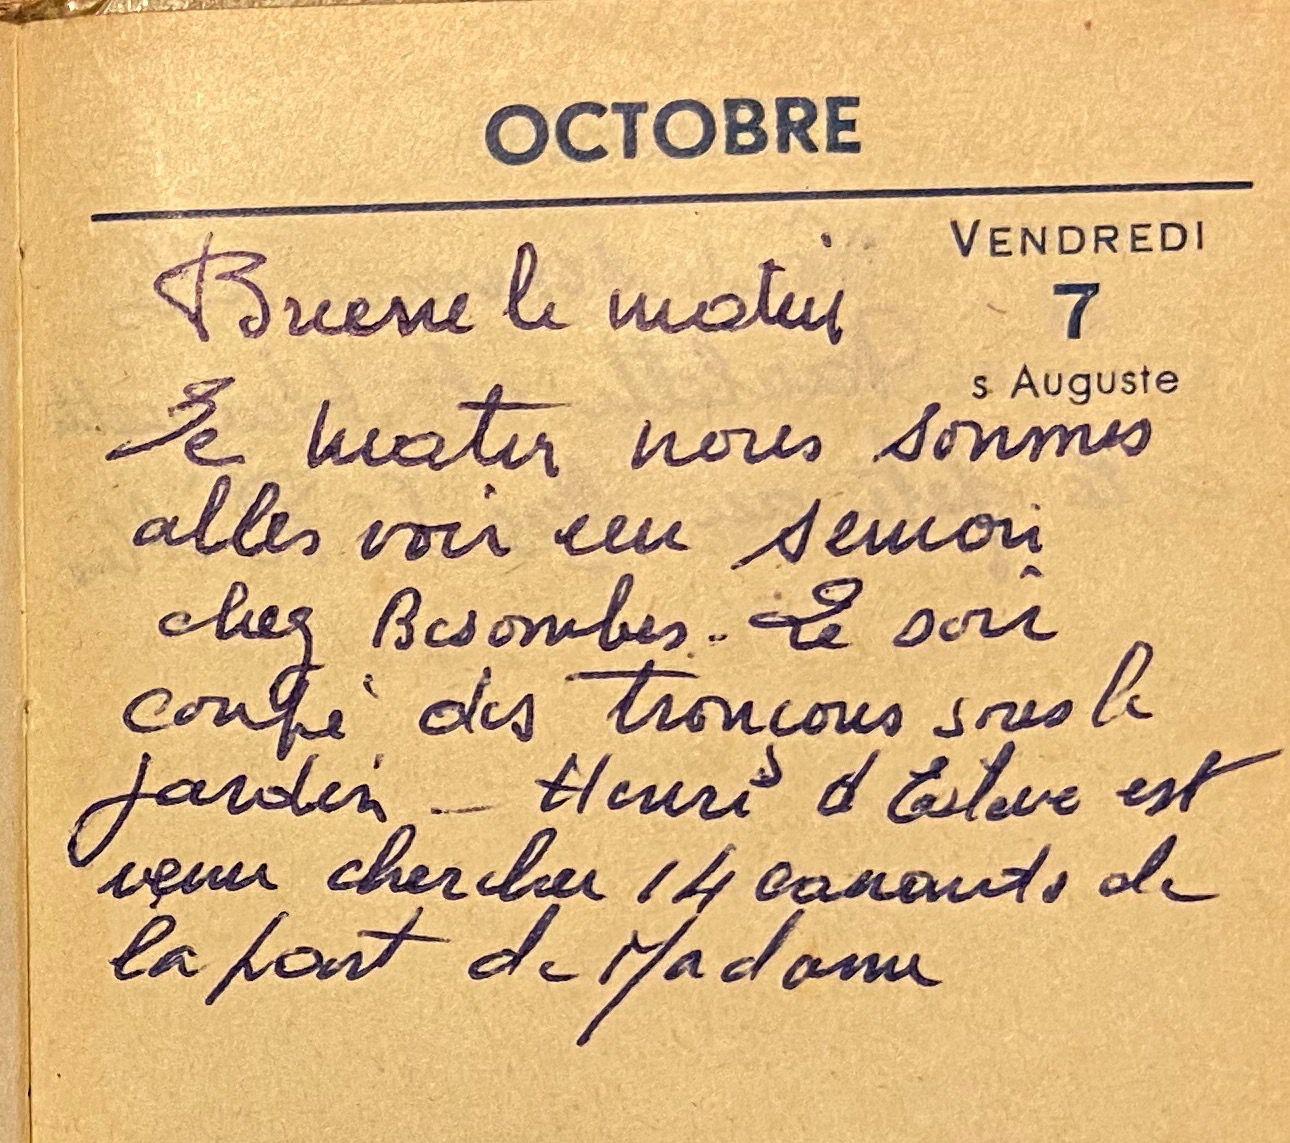 Vendredi 7 octobre 1960 - le semoir et les canards de Madame